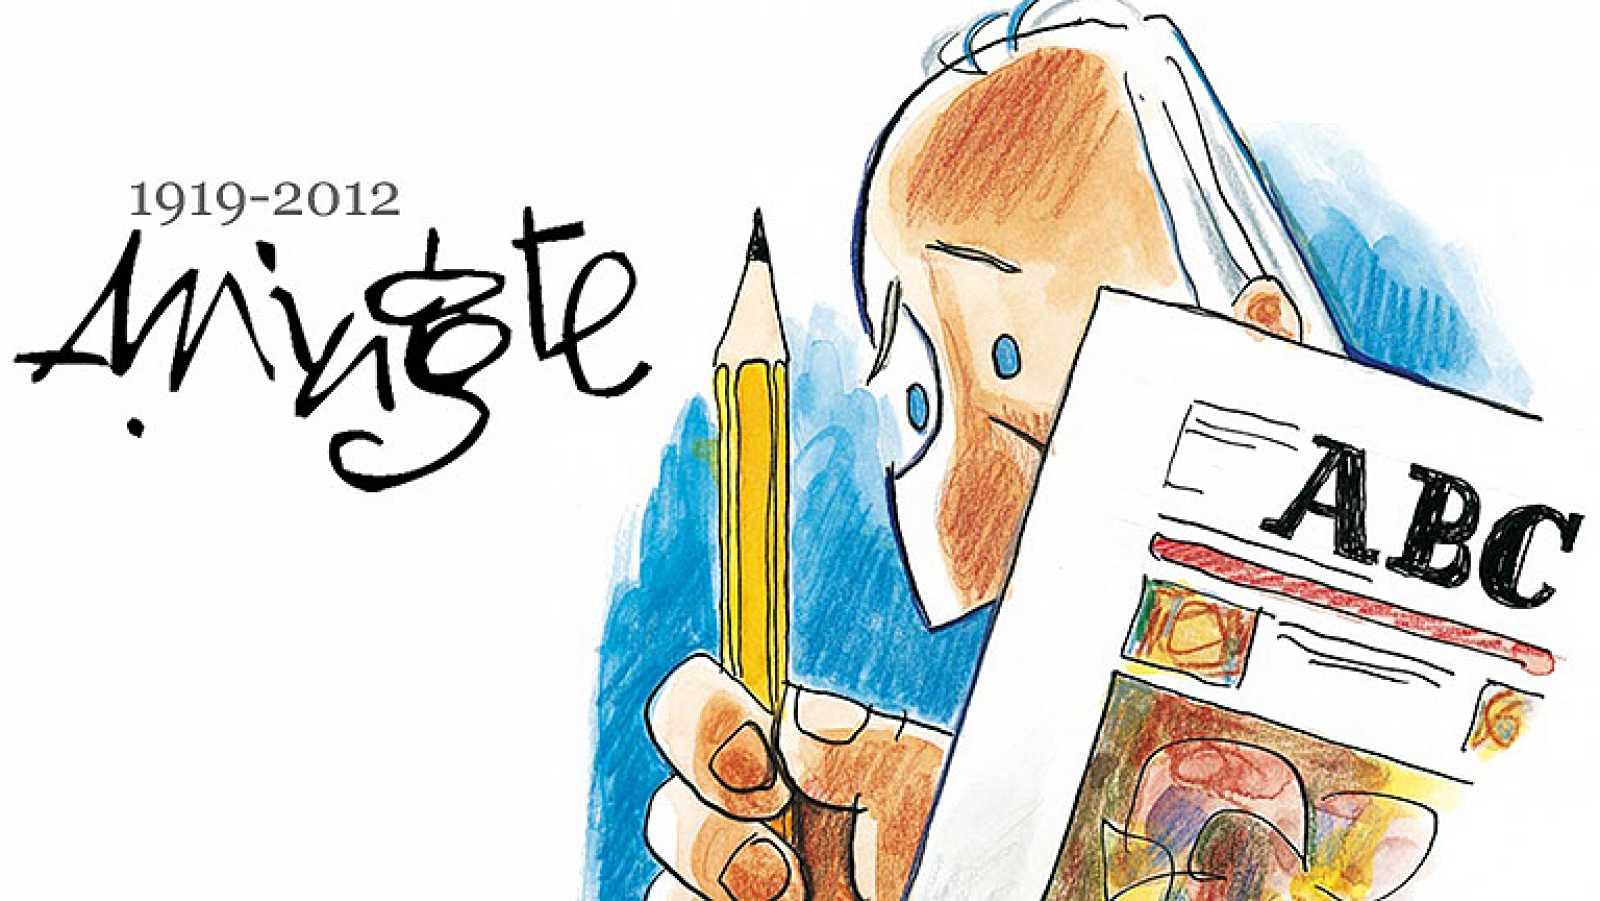 Mingote, el dibujante académico de la lengua nos dice adiós